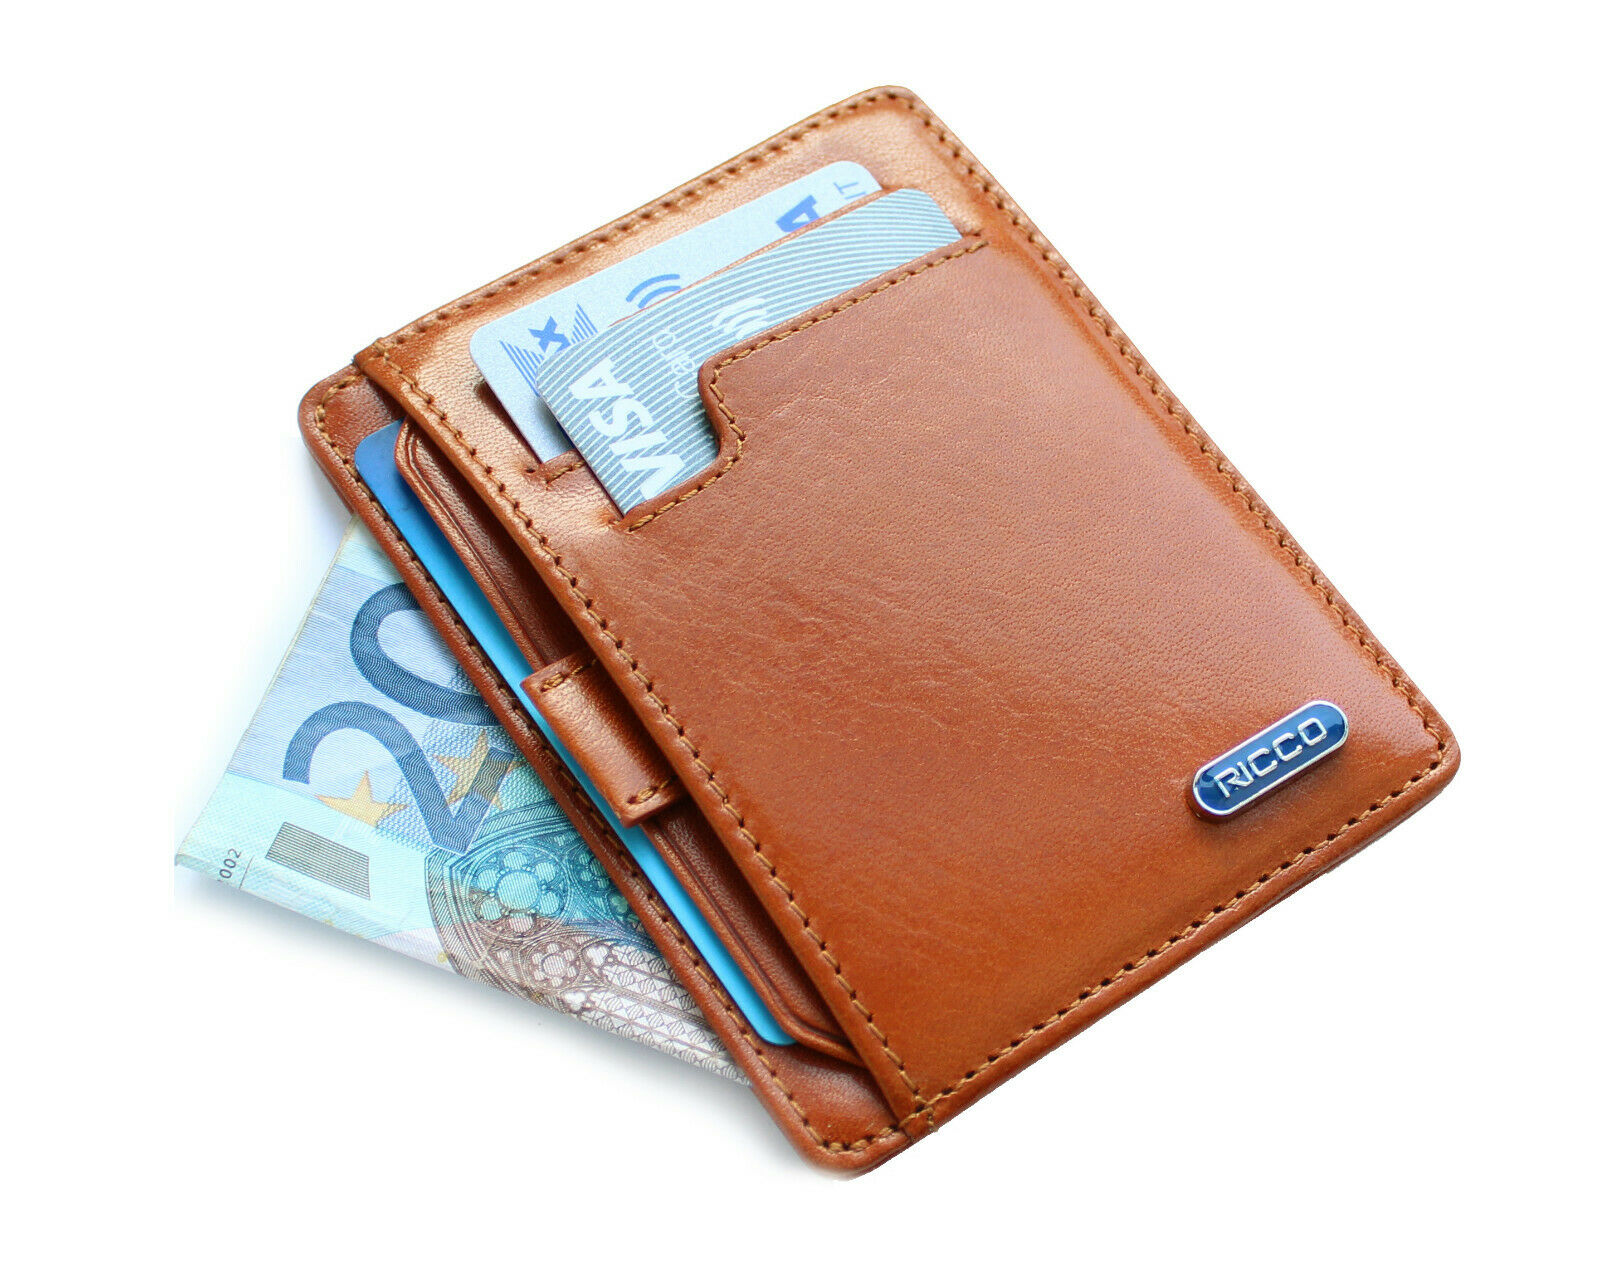 RICCO Italian Leather Front Pocket RFID Thin Cardholder Minimalist Wallet S11